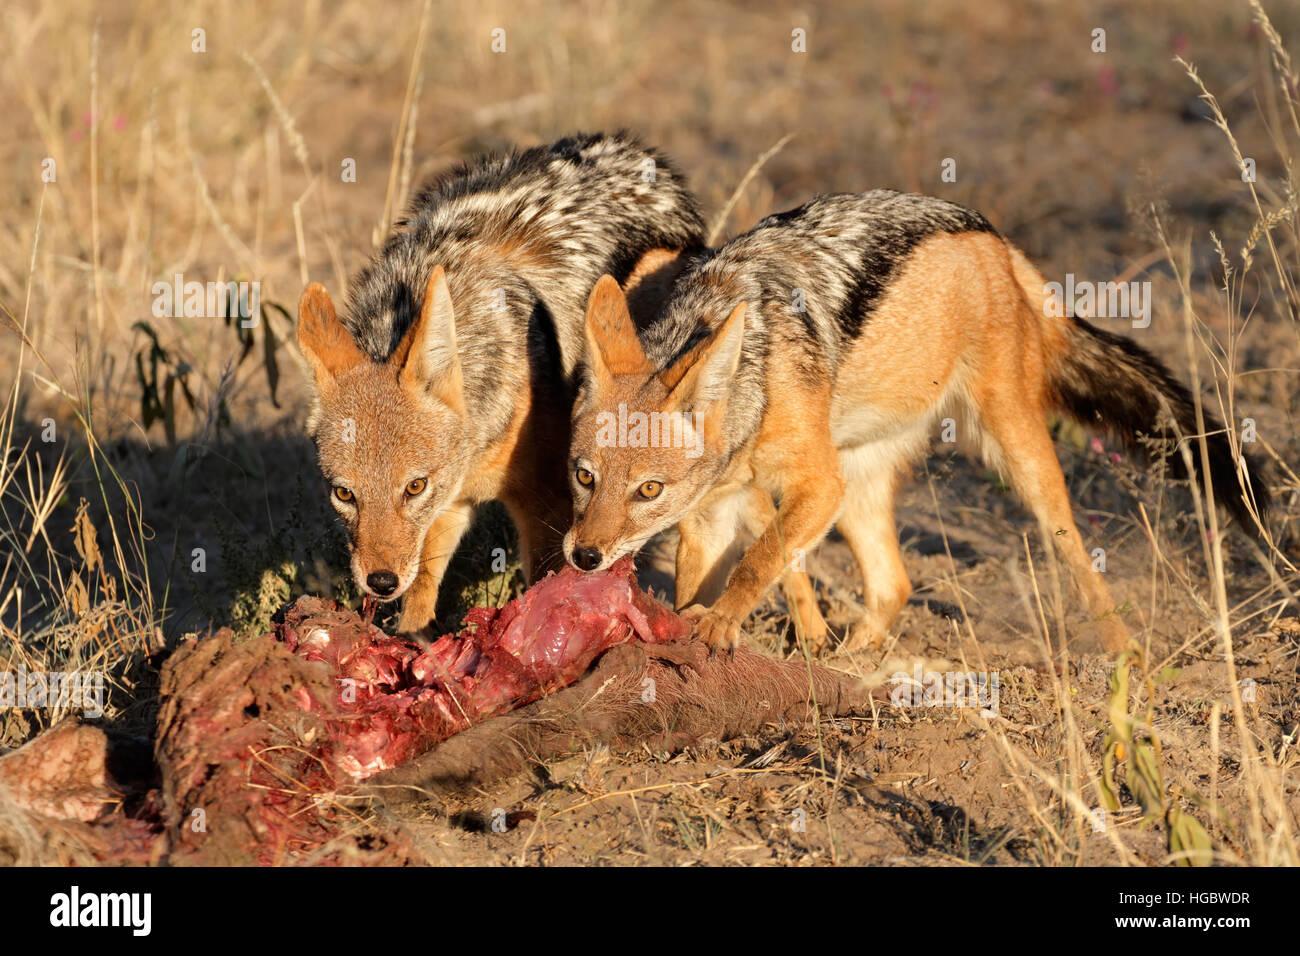 Nero-backed sciacalli (Canis mesomelas scavenging) su una carcassa, Sud Africa Immagini Stock